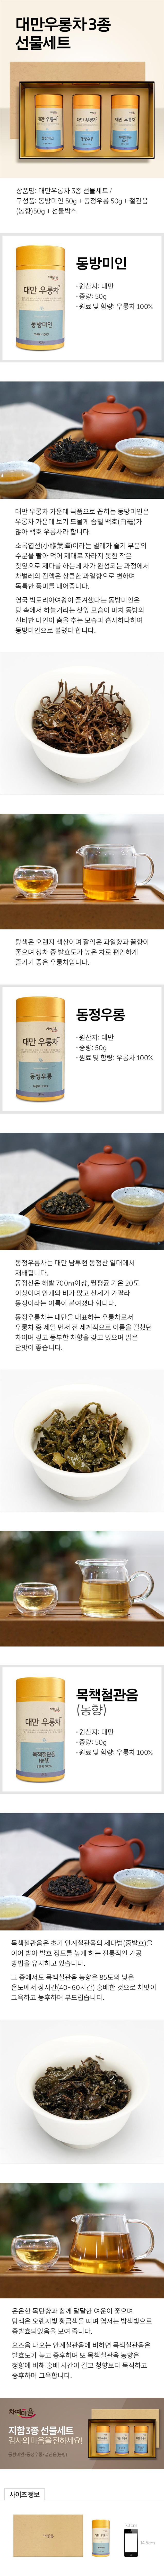 [ HagwanChaChang ] [ChayeTown]Oolong Tea 3P Present Set